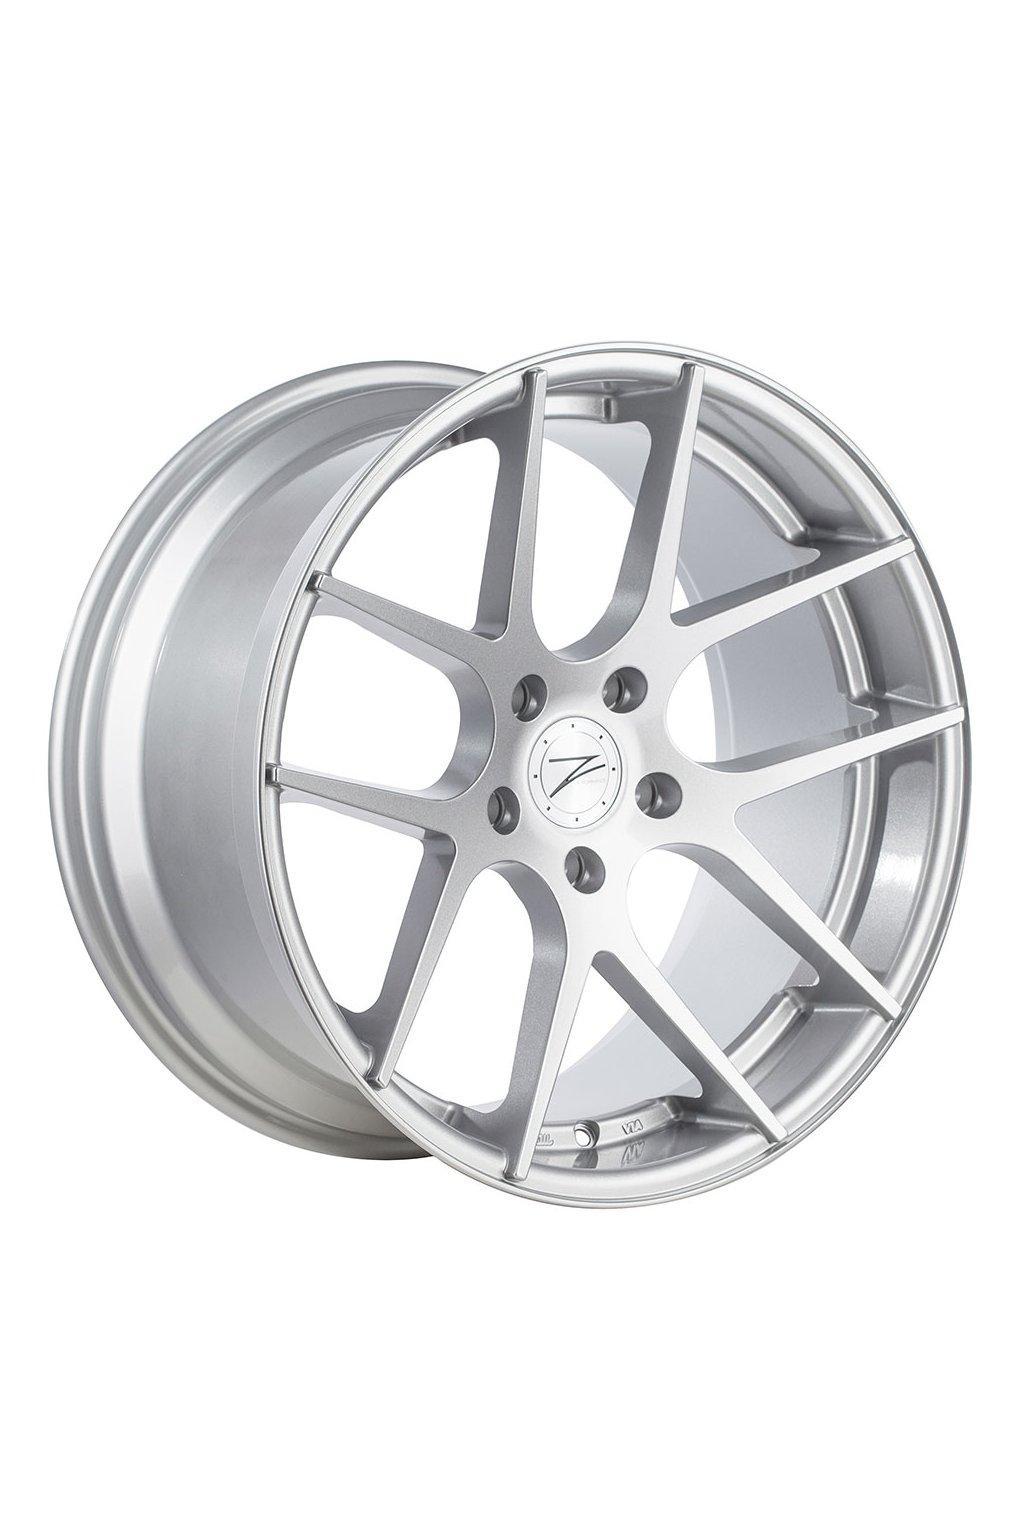 Disk Z-Performance ZP.07 8x18 ET35 5x120 Sparkling Silver